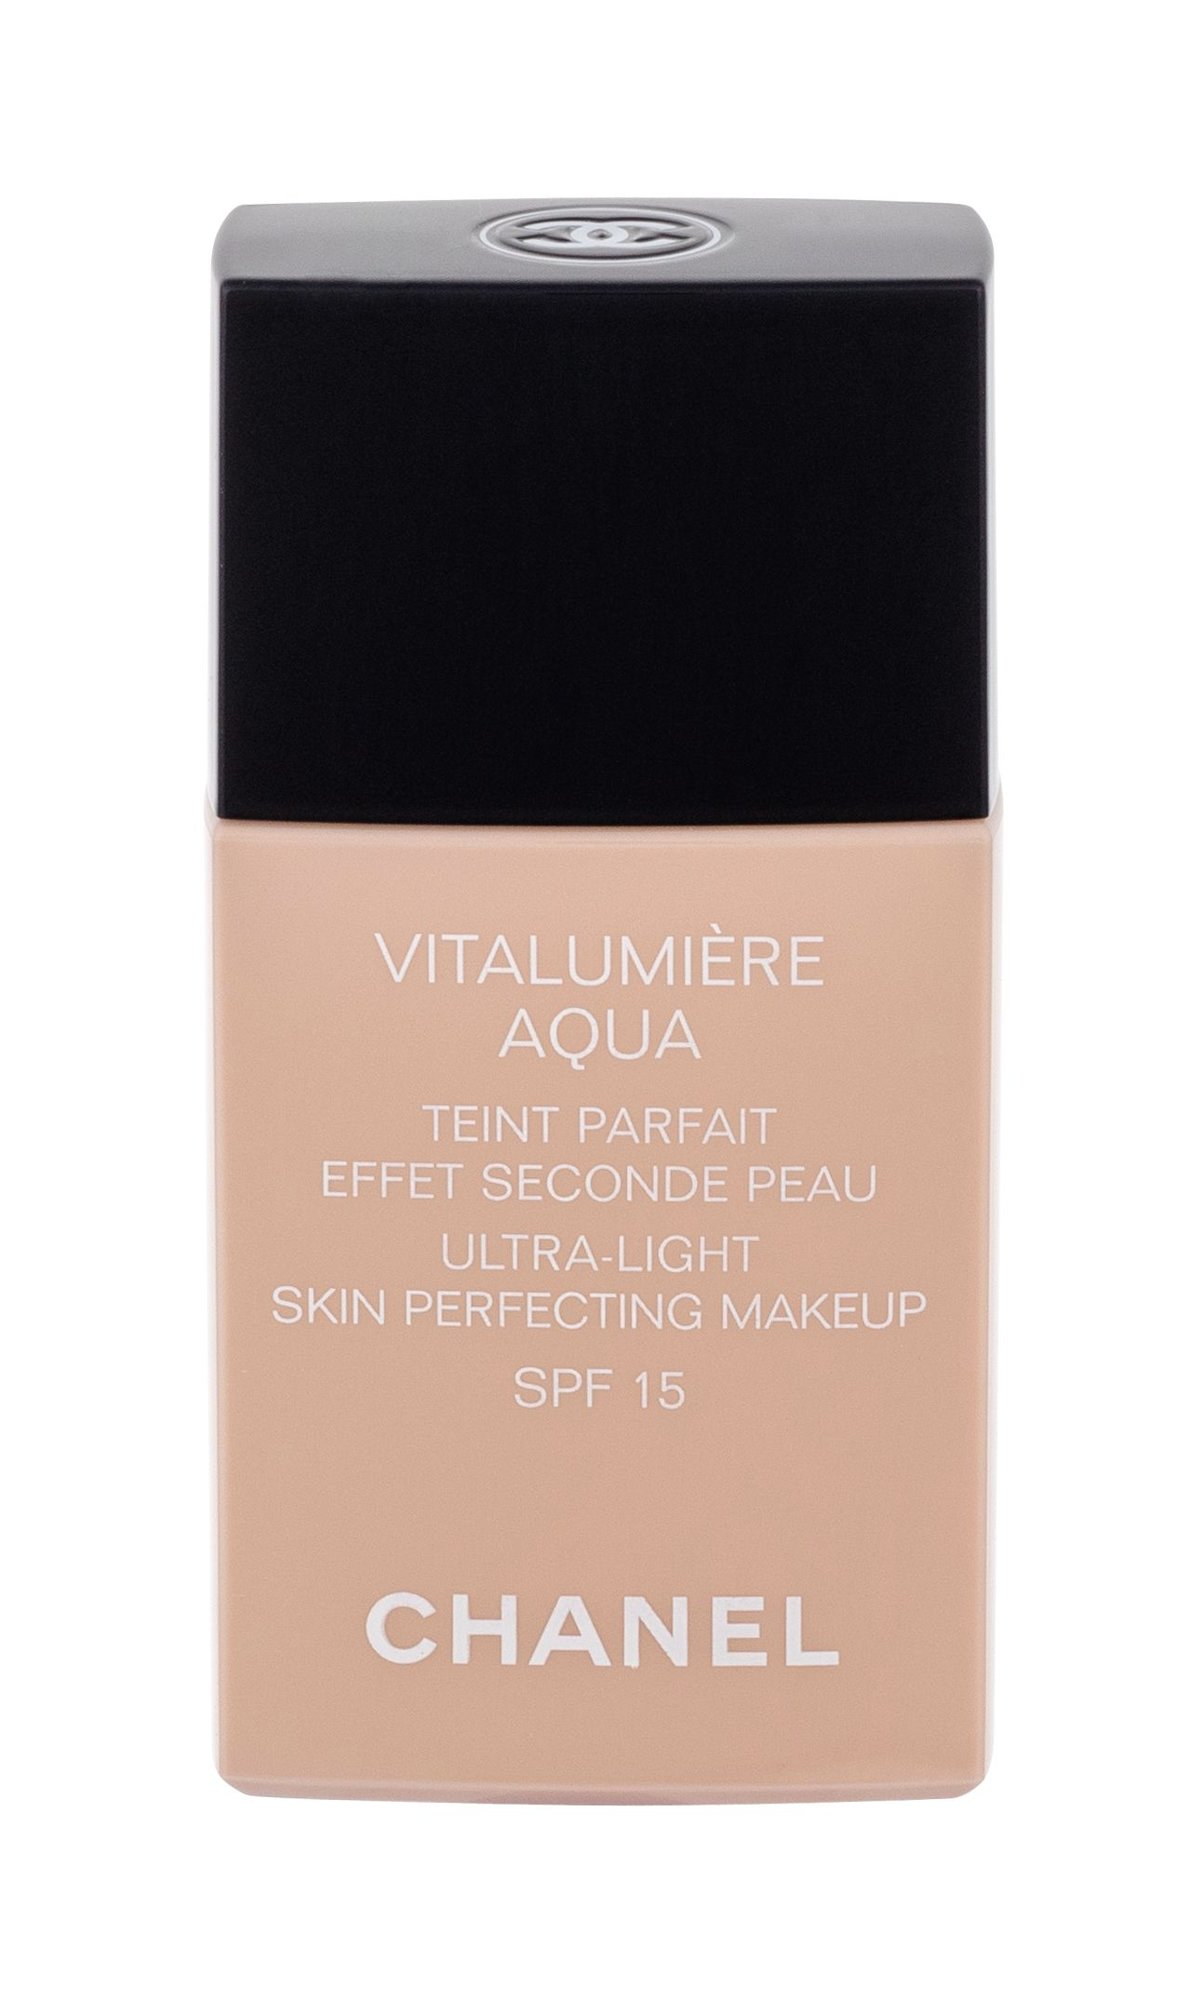 Chanel Vitalumiere Aqua Cosmetic 30ml 42 Beige Rosé